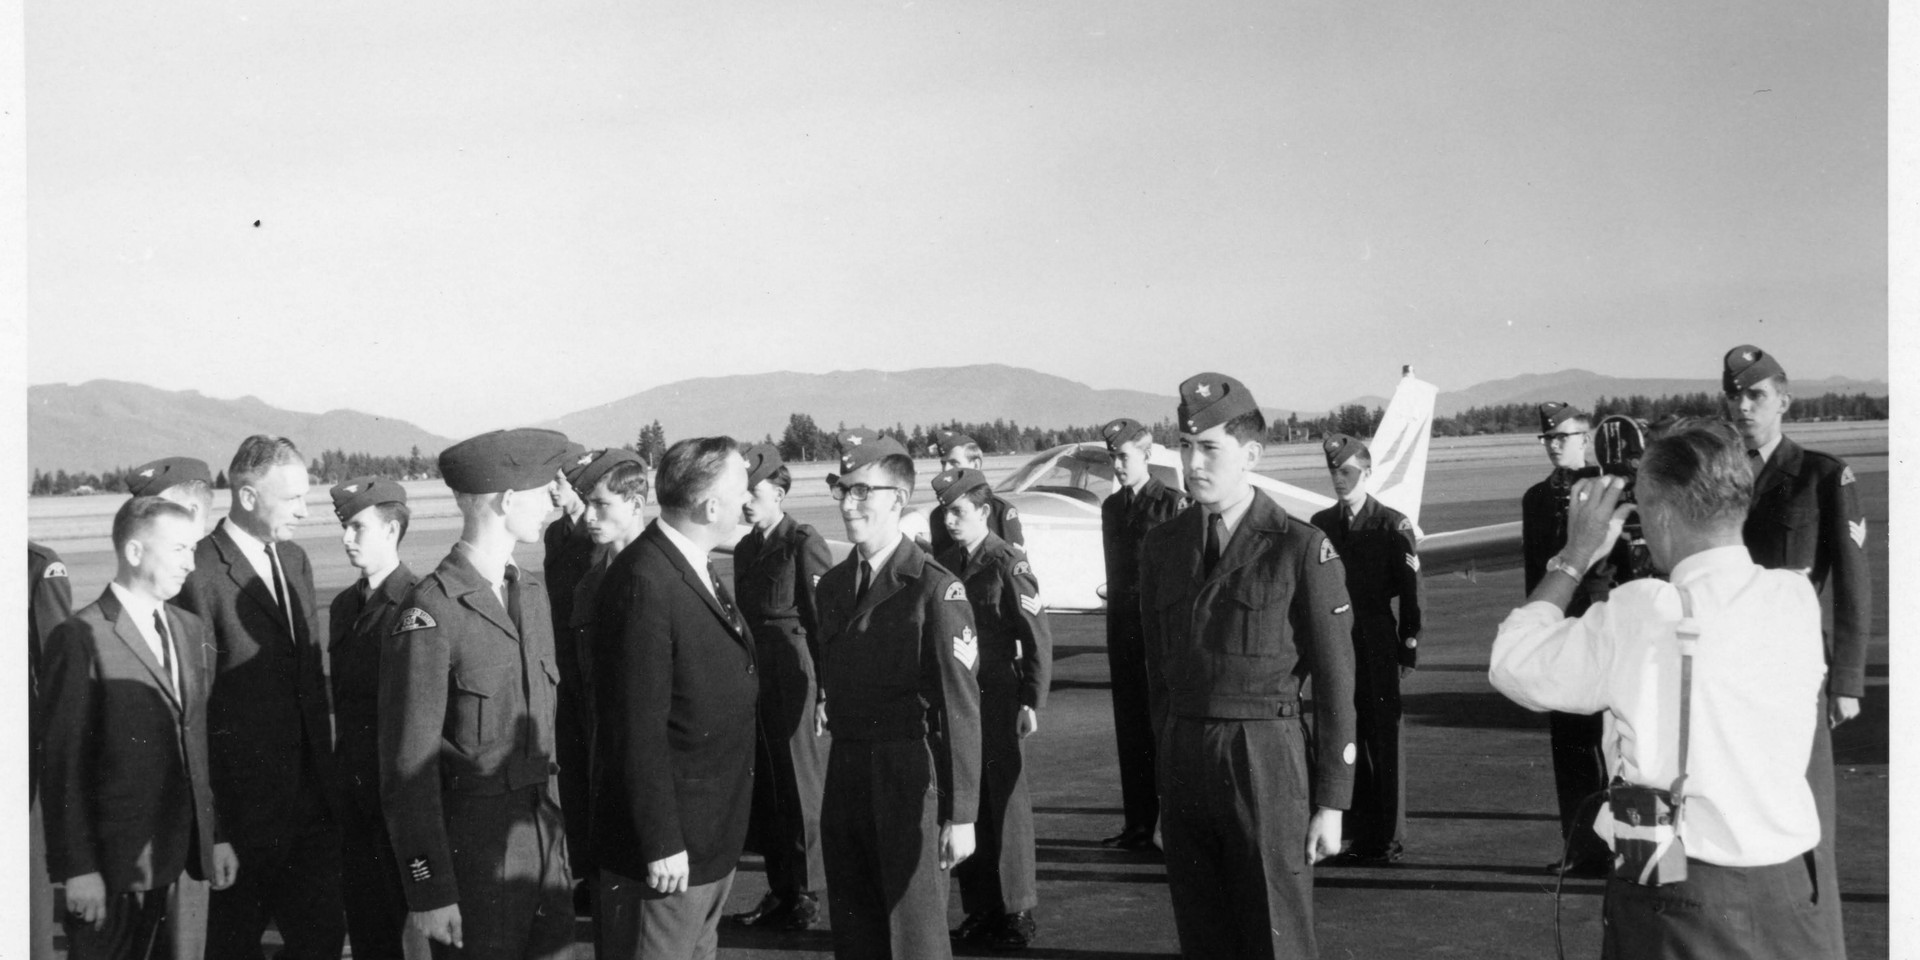 19. Wings Parade, Air Cadet Flying Train